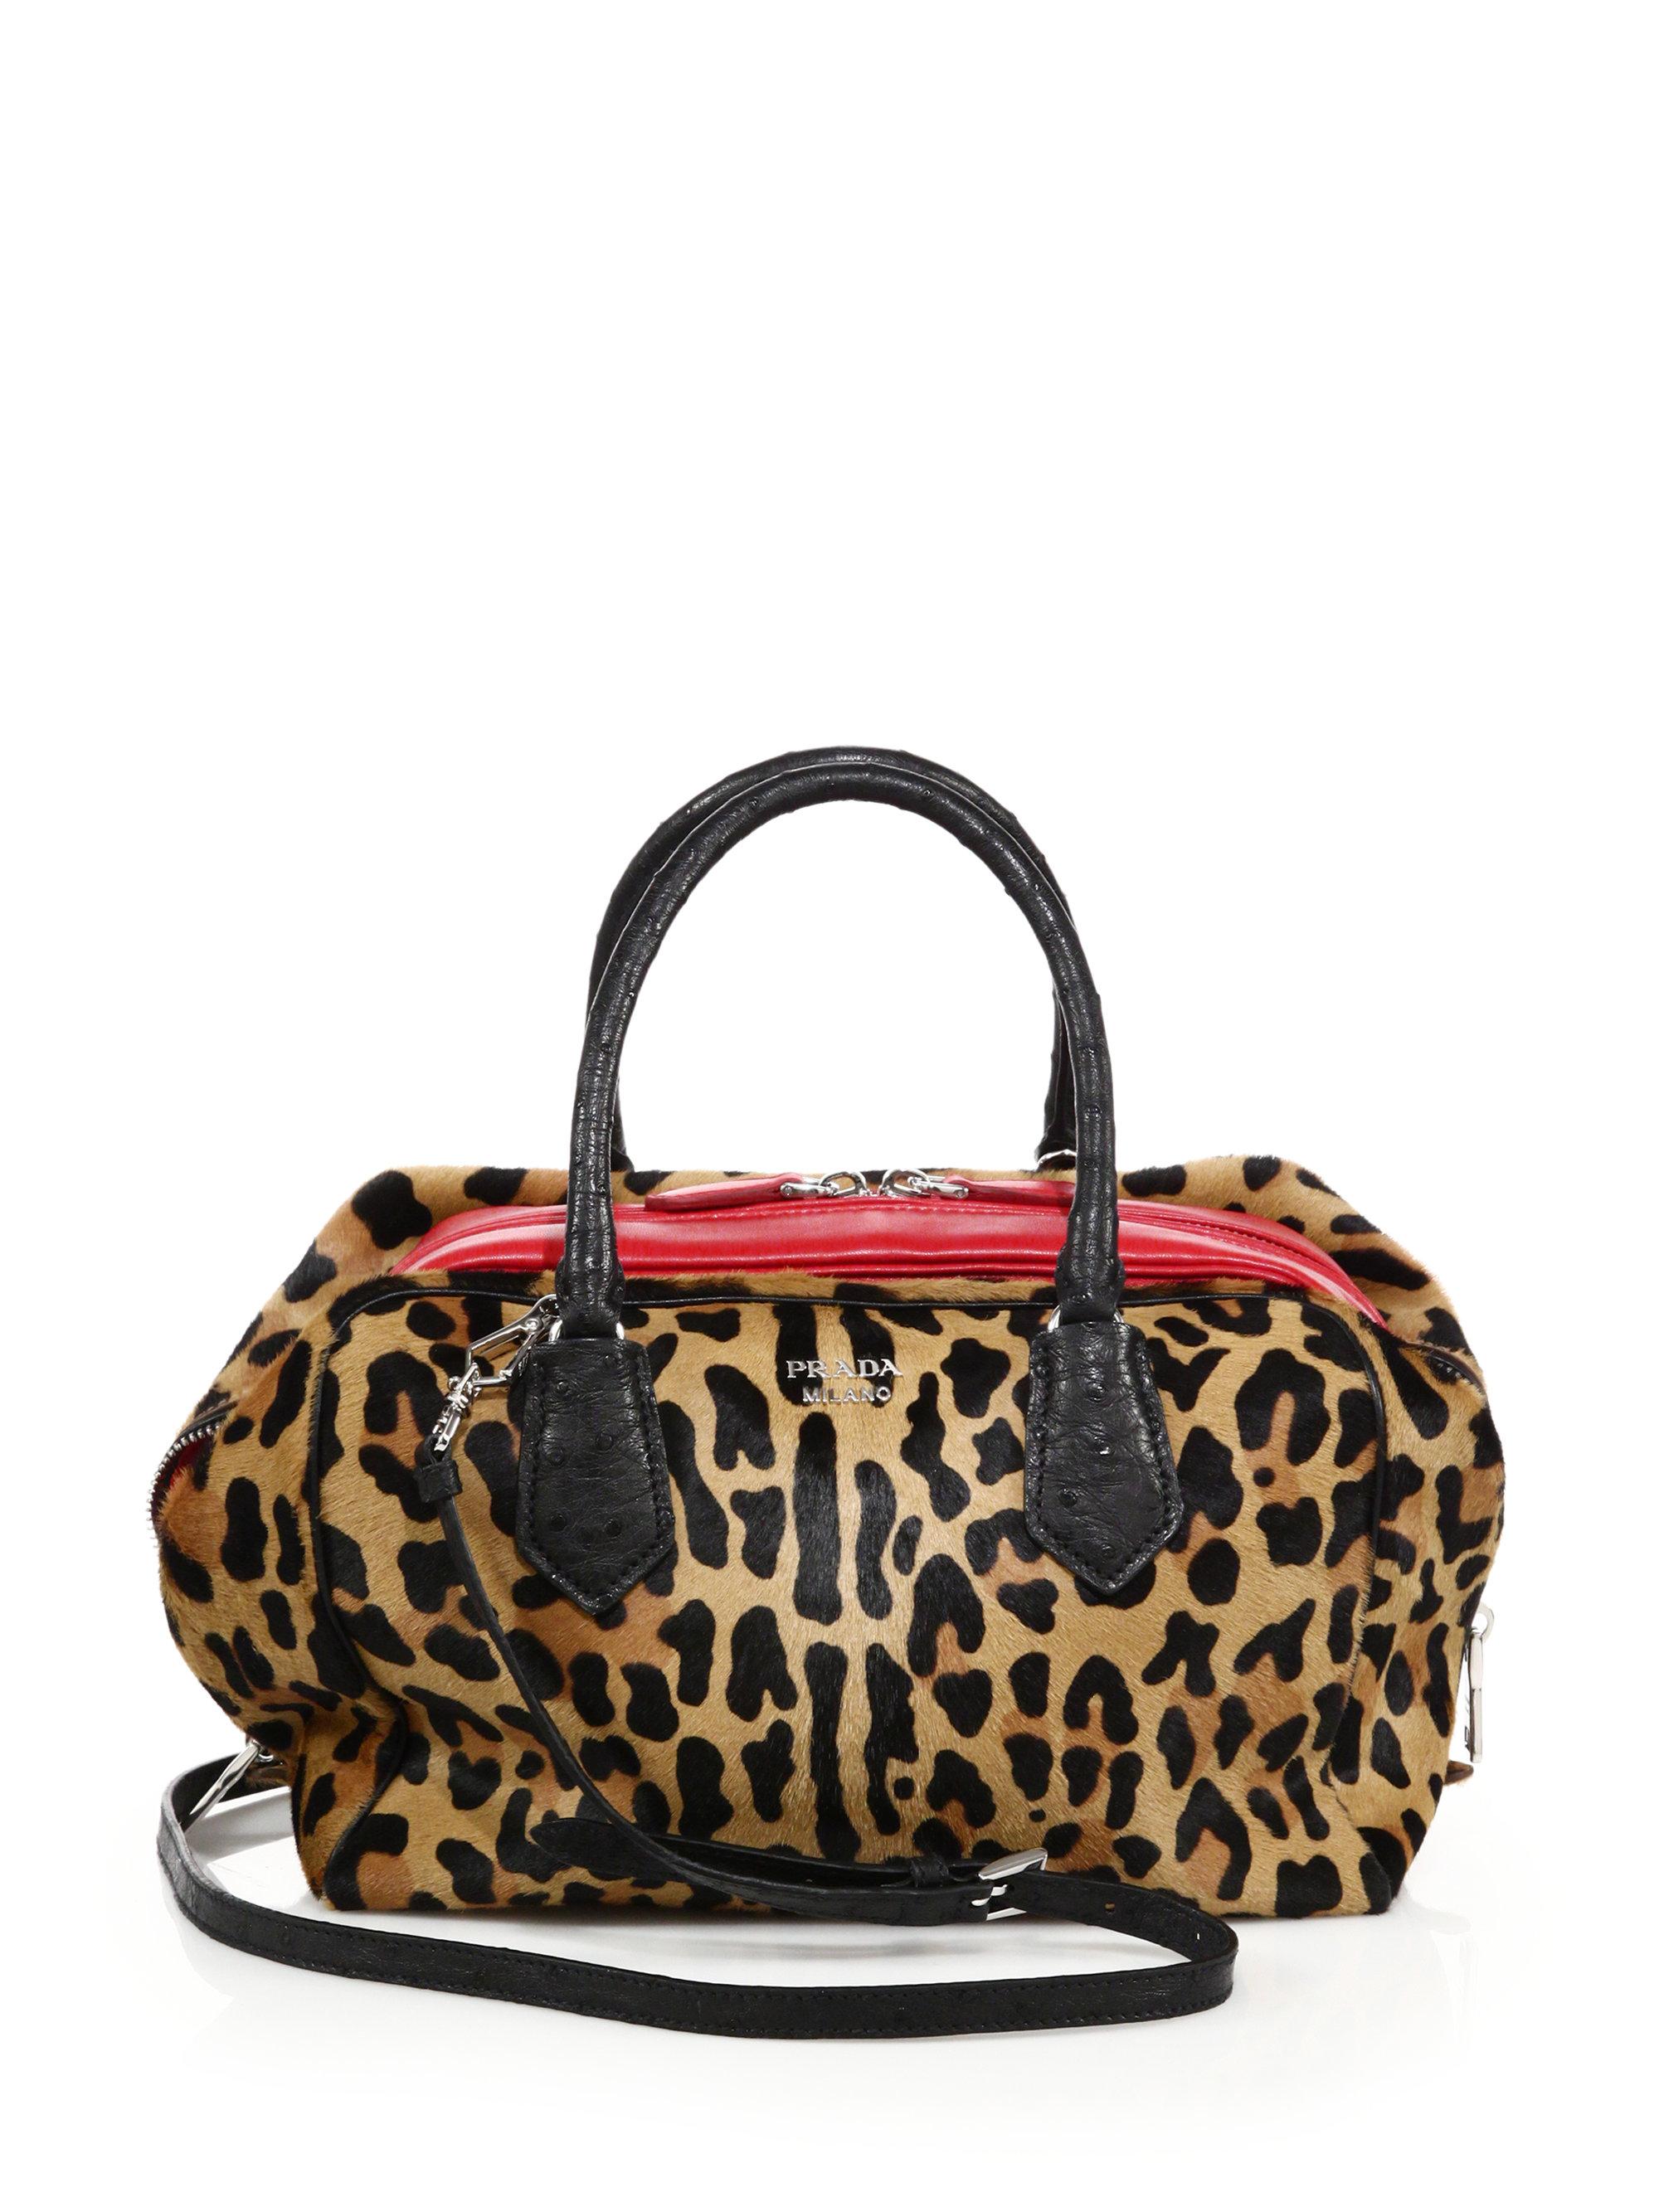 efb825e4837 ... wholesale lyst prada leopard print calf hair ostrich leather inside bag  9a48f 4c5c1